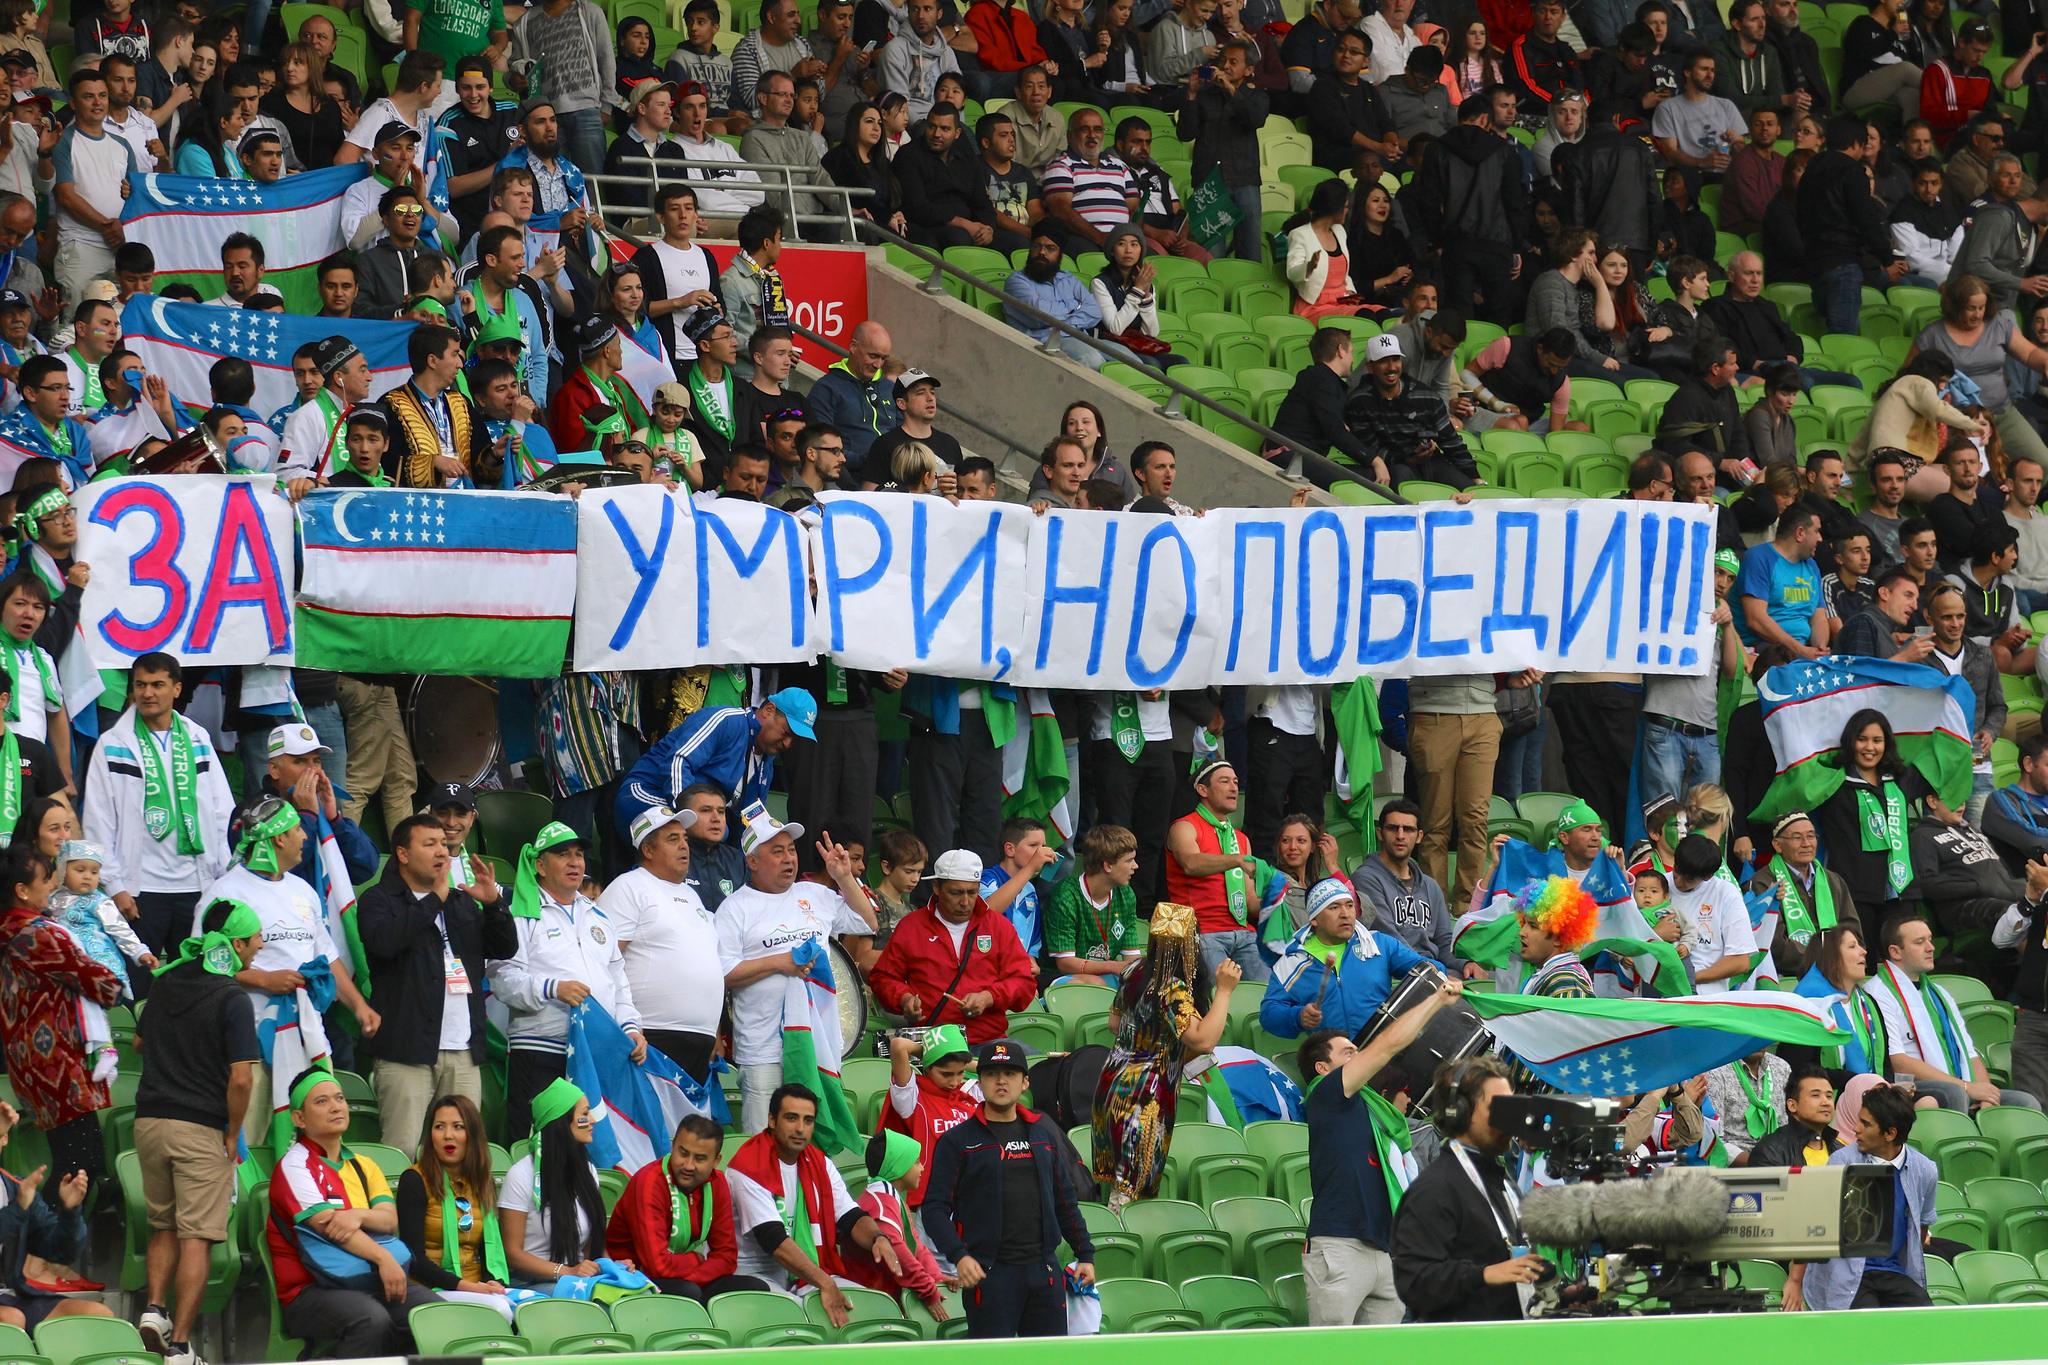 Ouzbékistan supporters Football